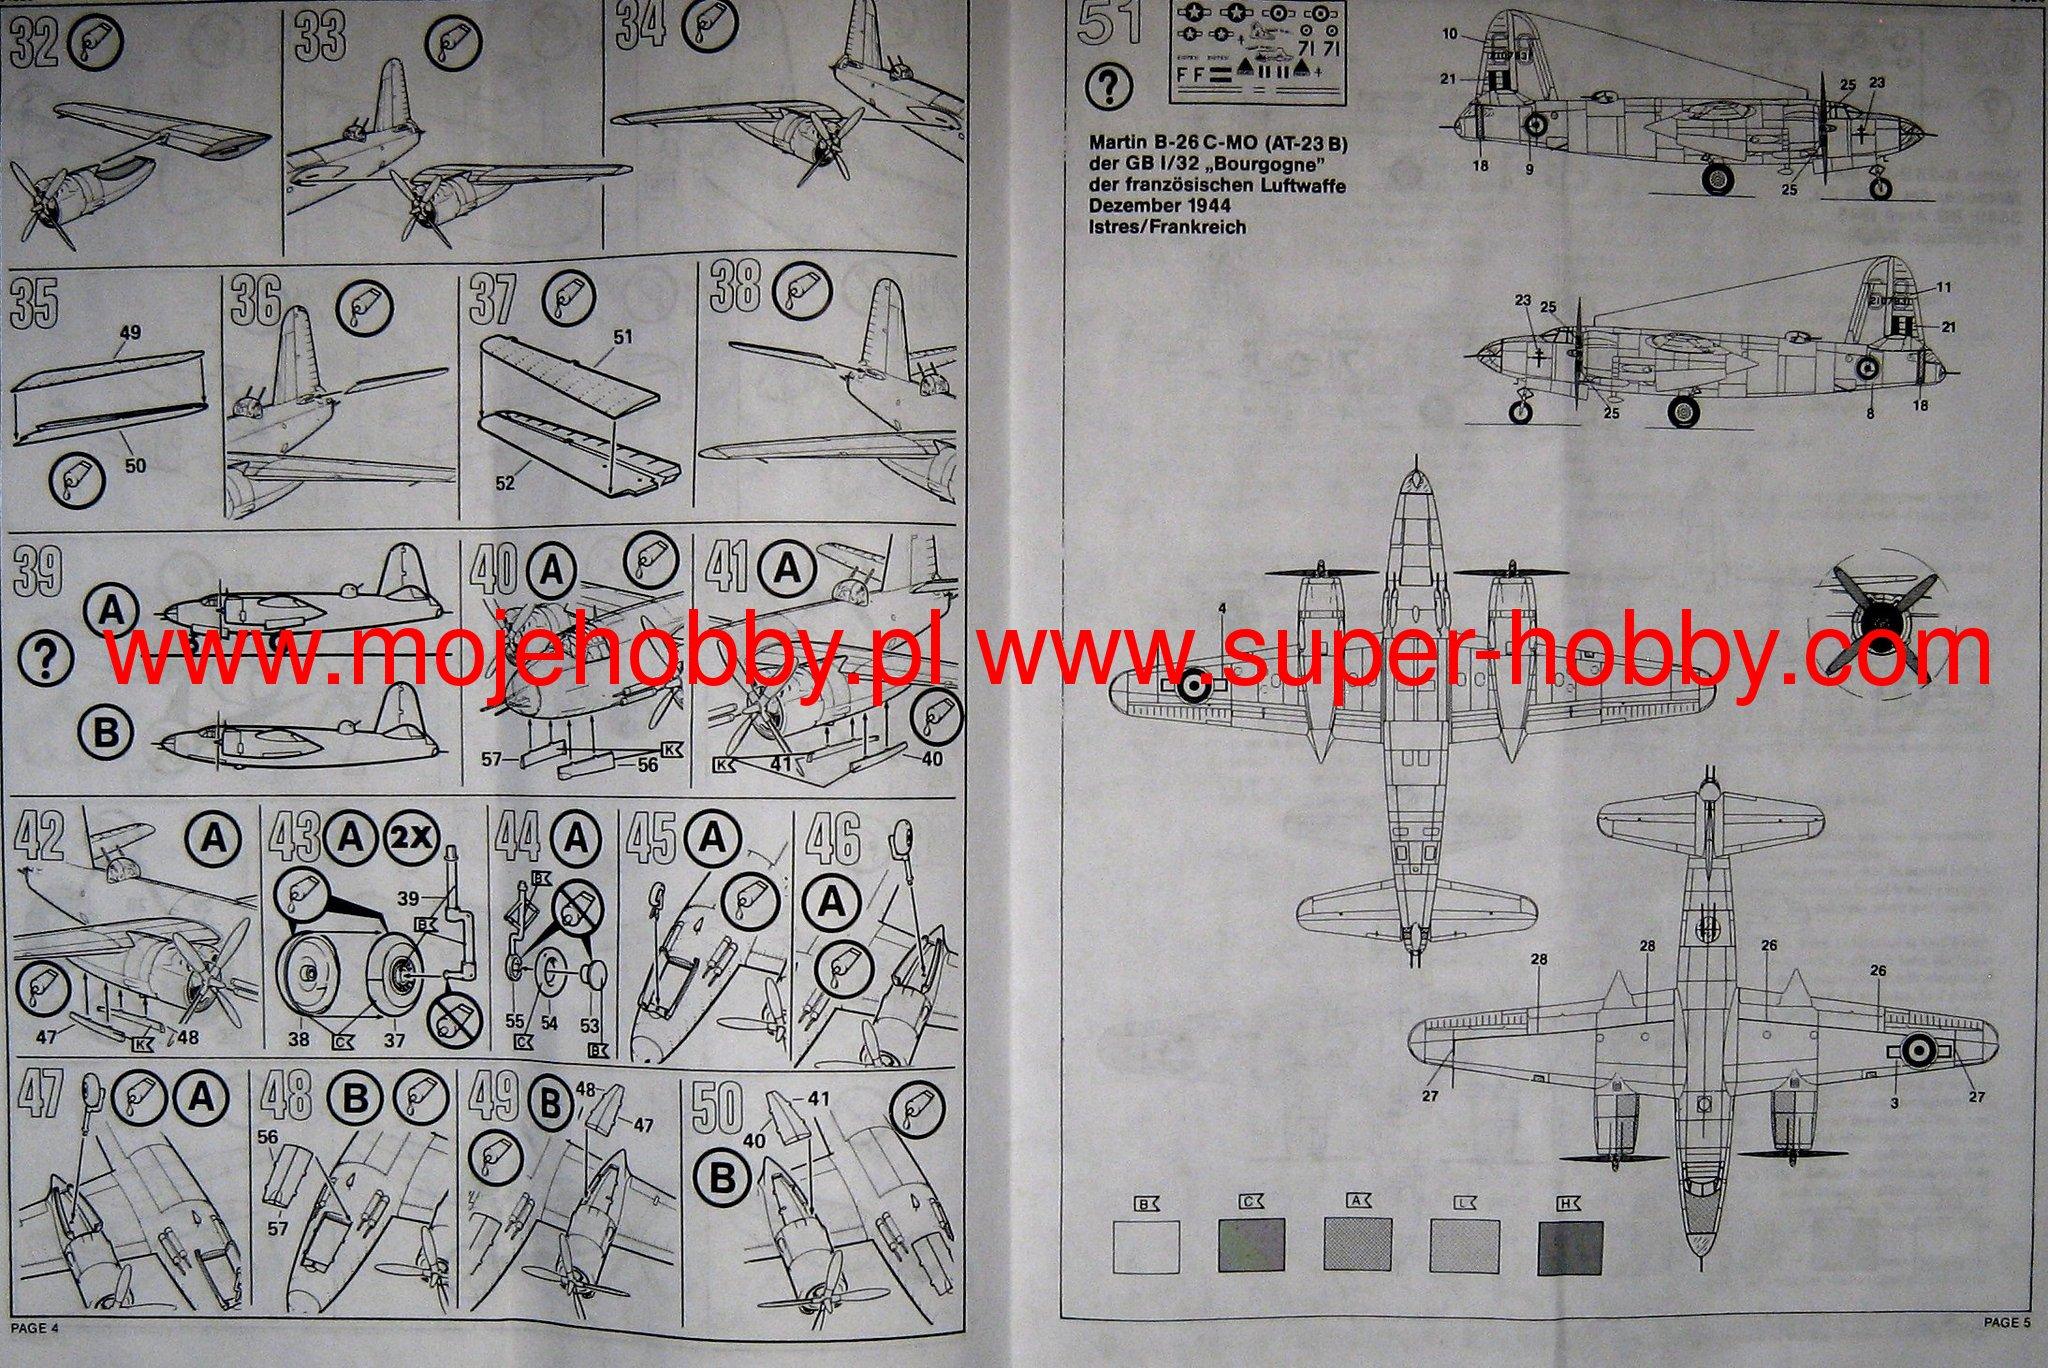 Martin B 26 Marauder Revell 04325 Engine Diagram 2 Rev04325 3